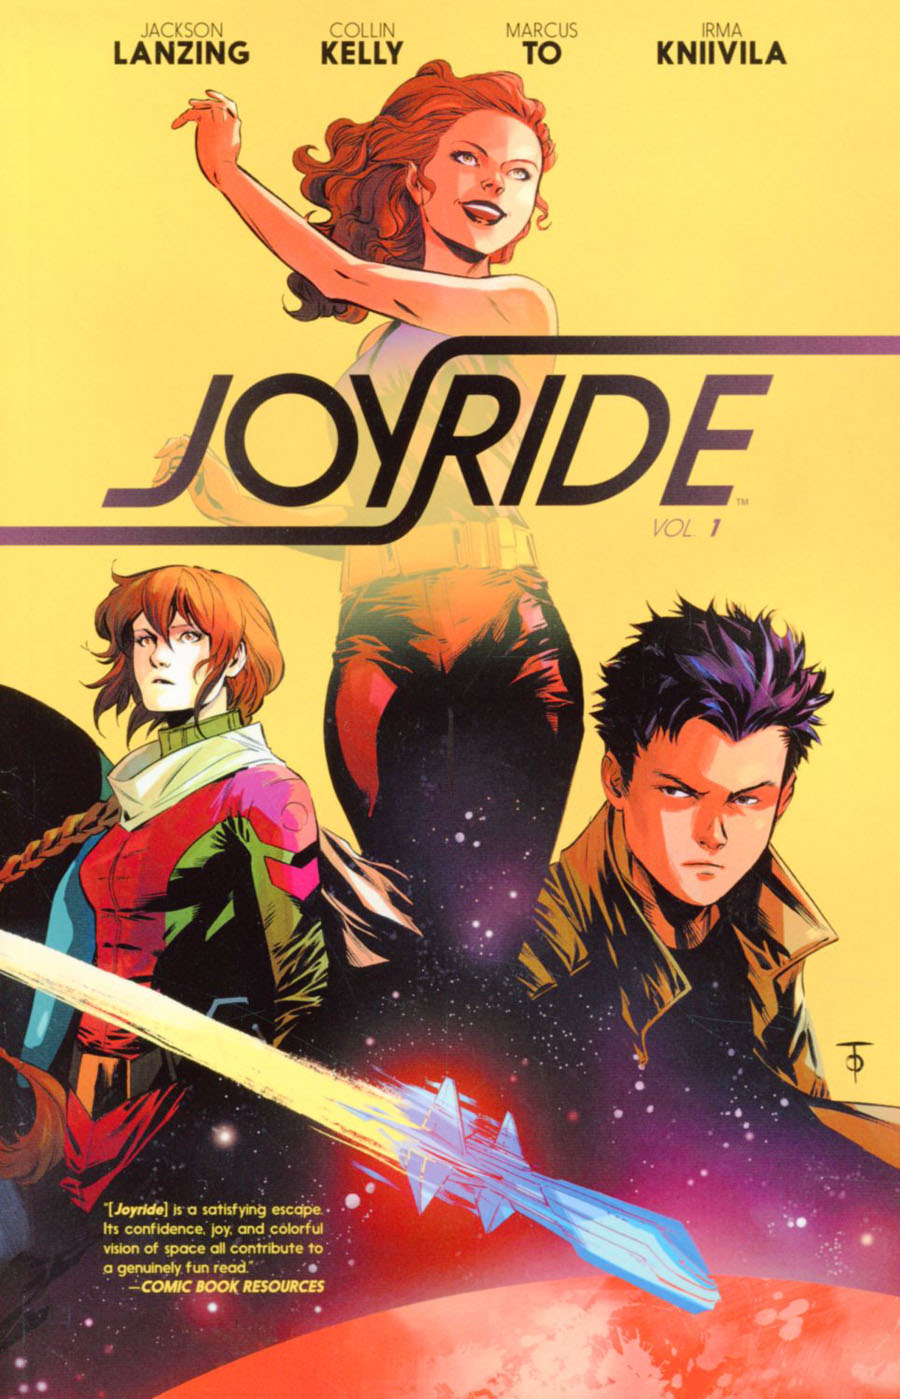 Joyride Vol 1 TP